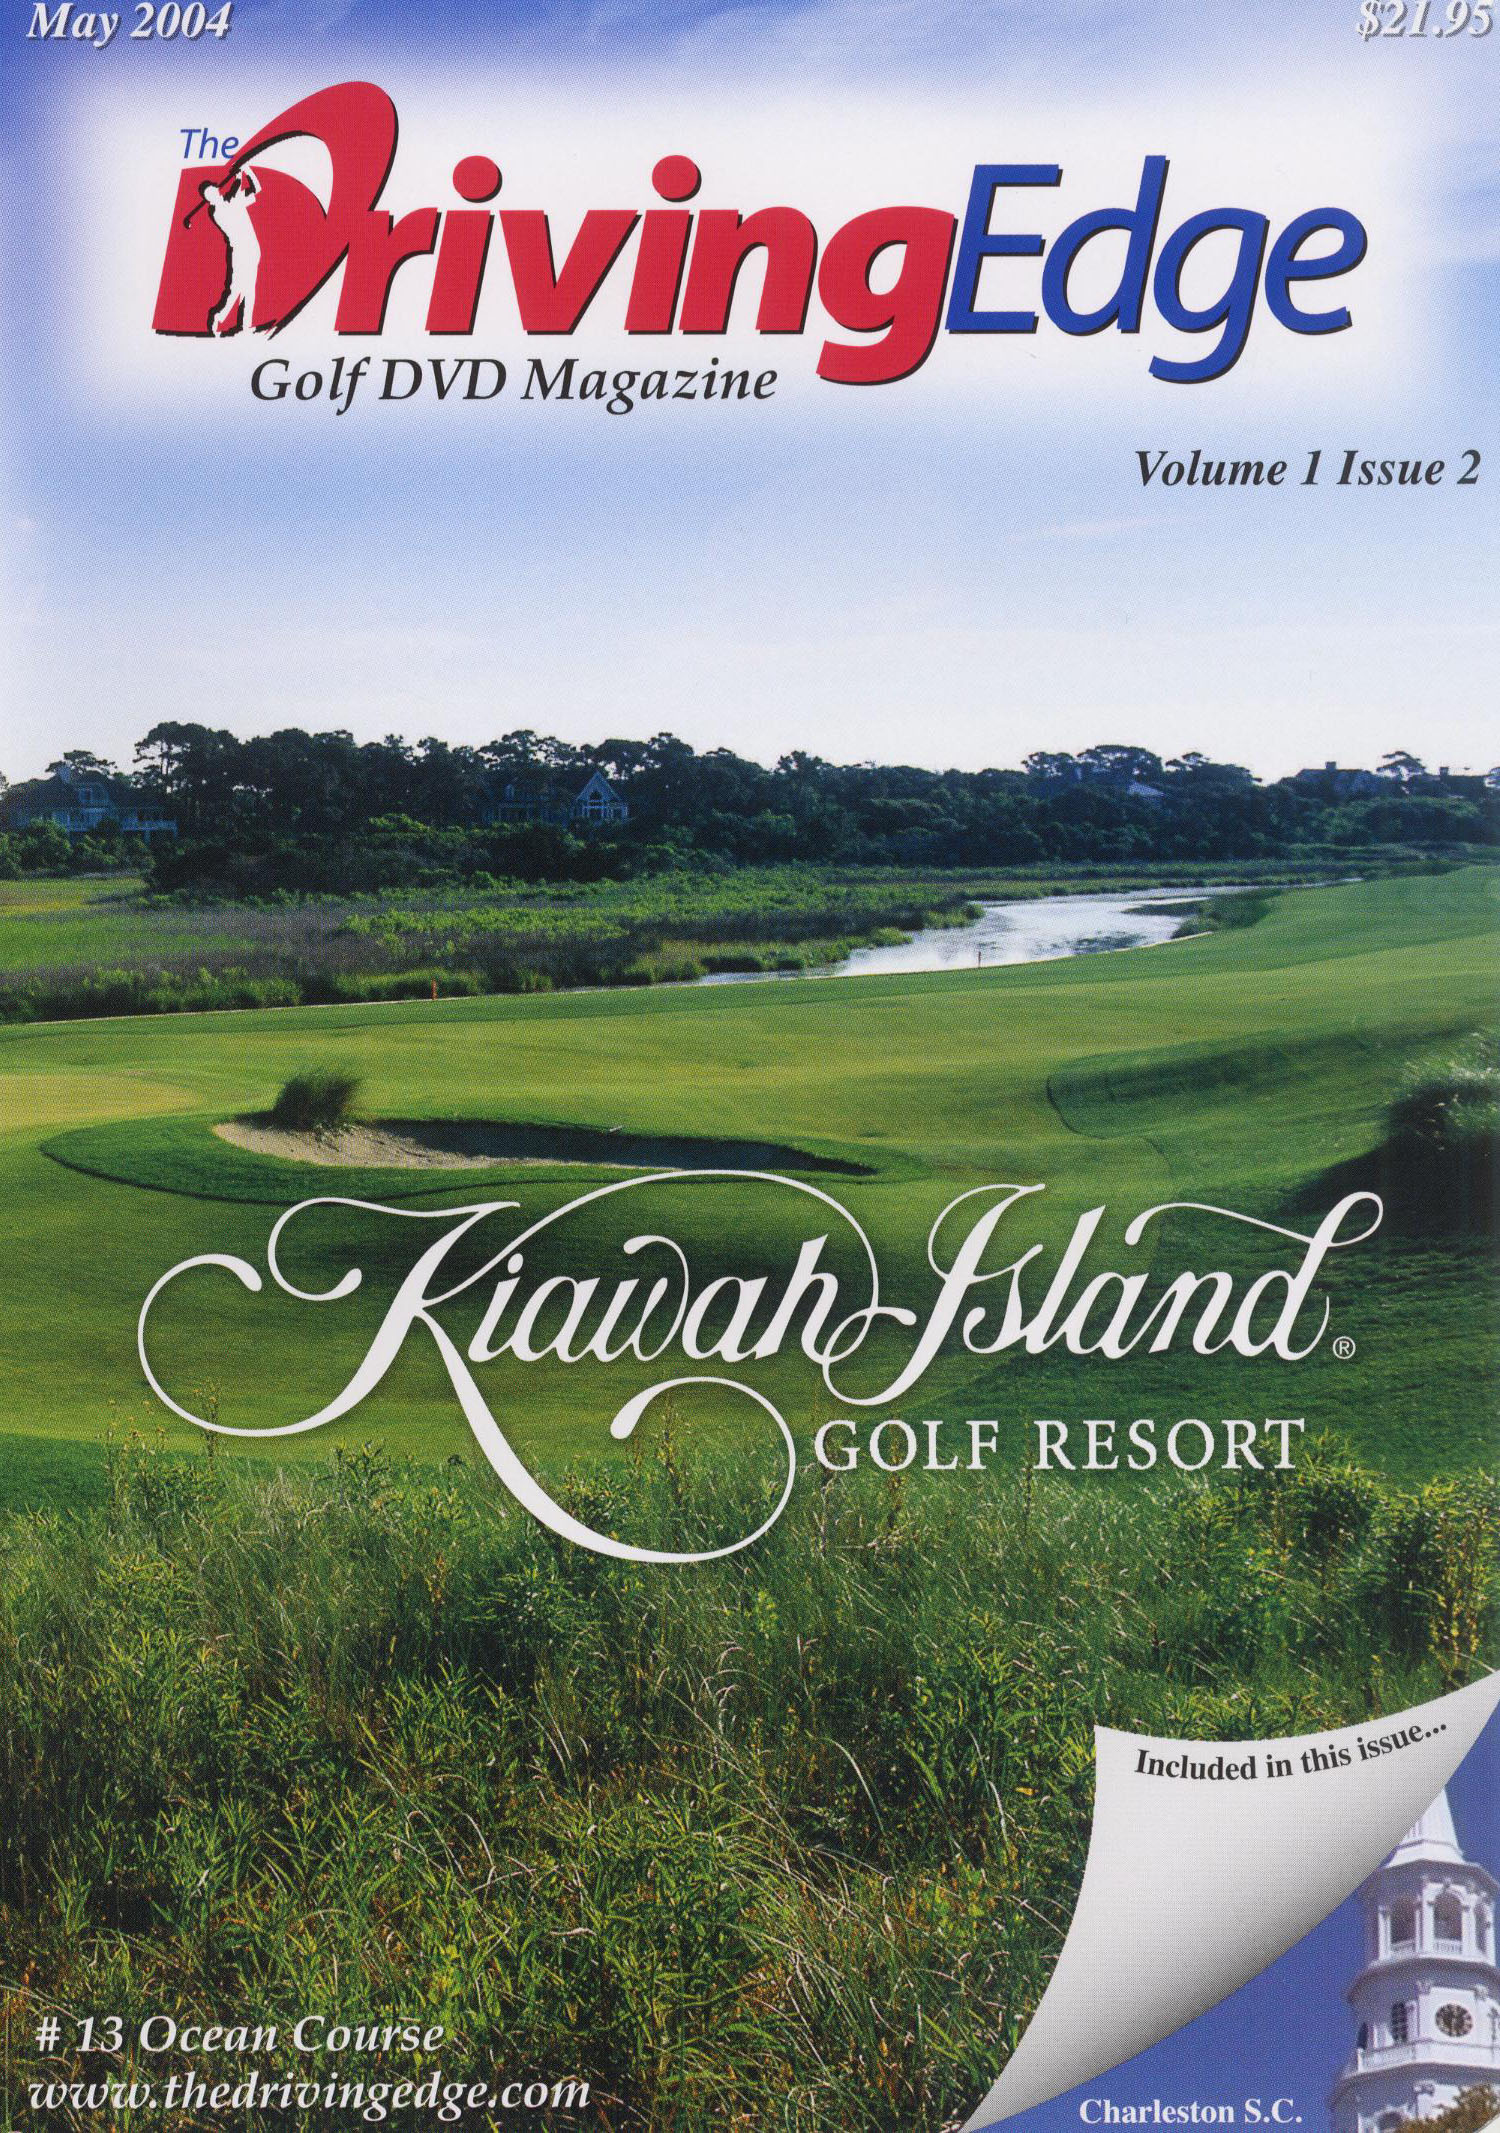 Driving Edge Golf DVD Magazine: Kiawah Island Golf